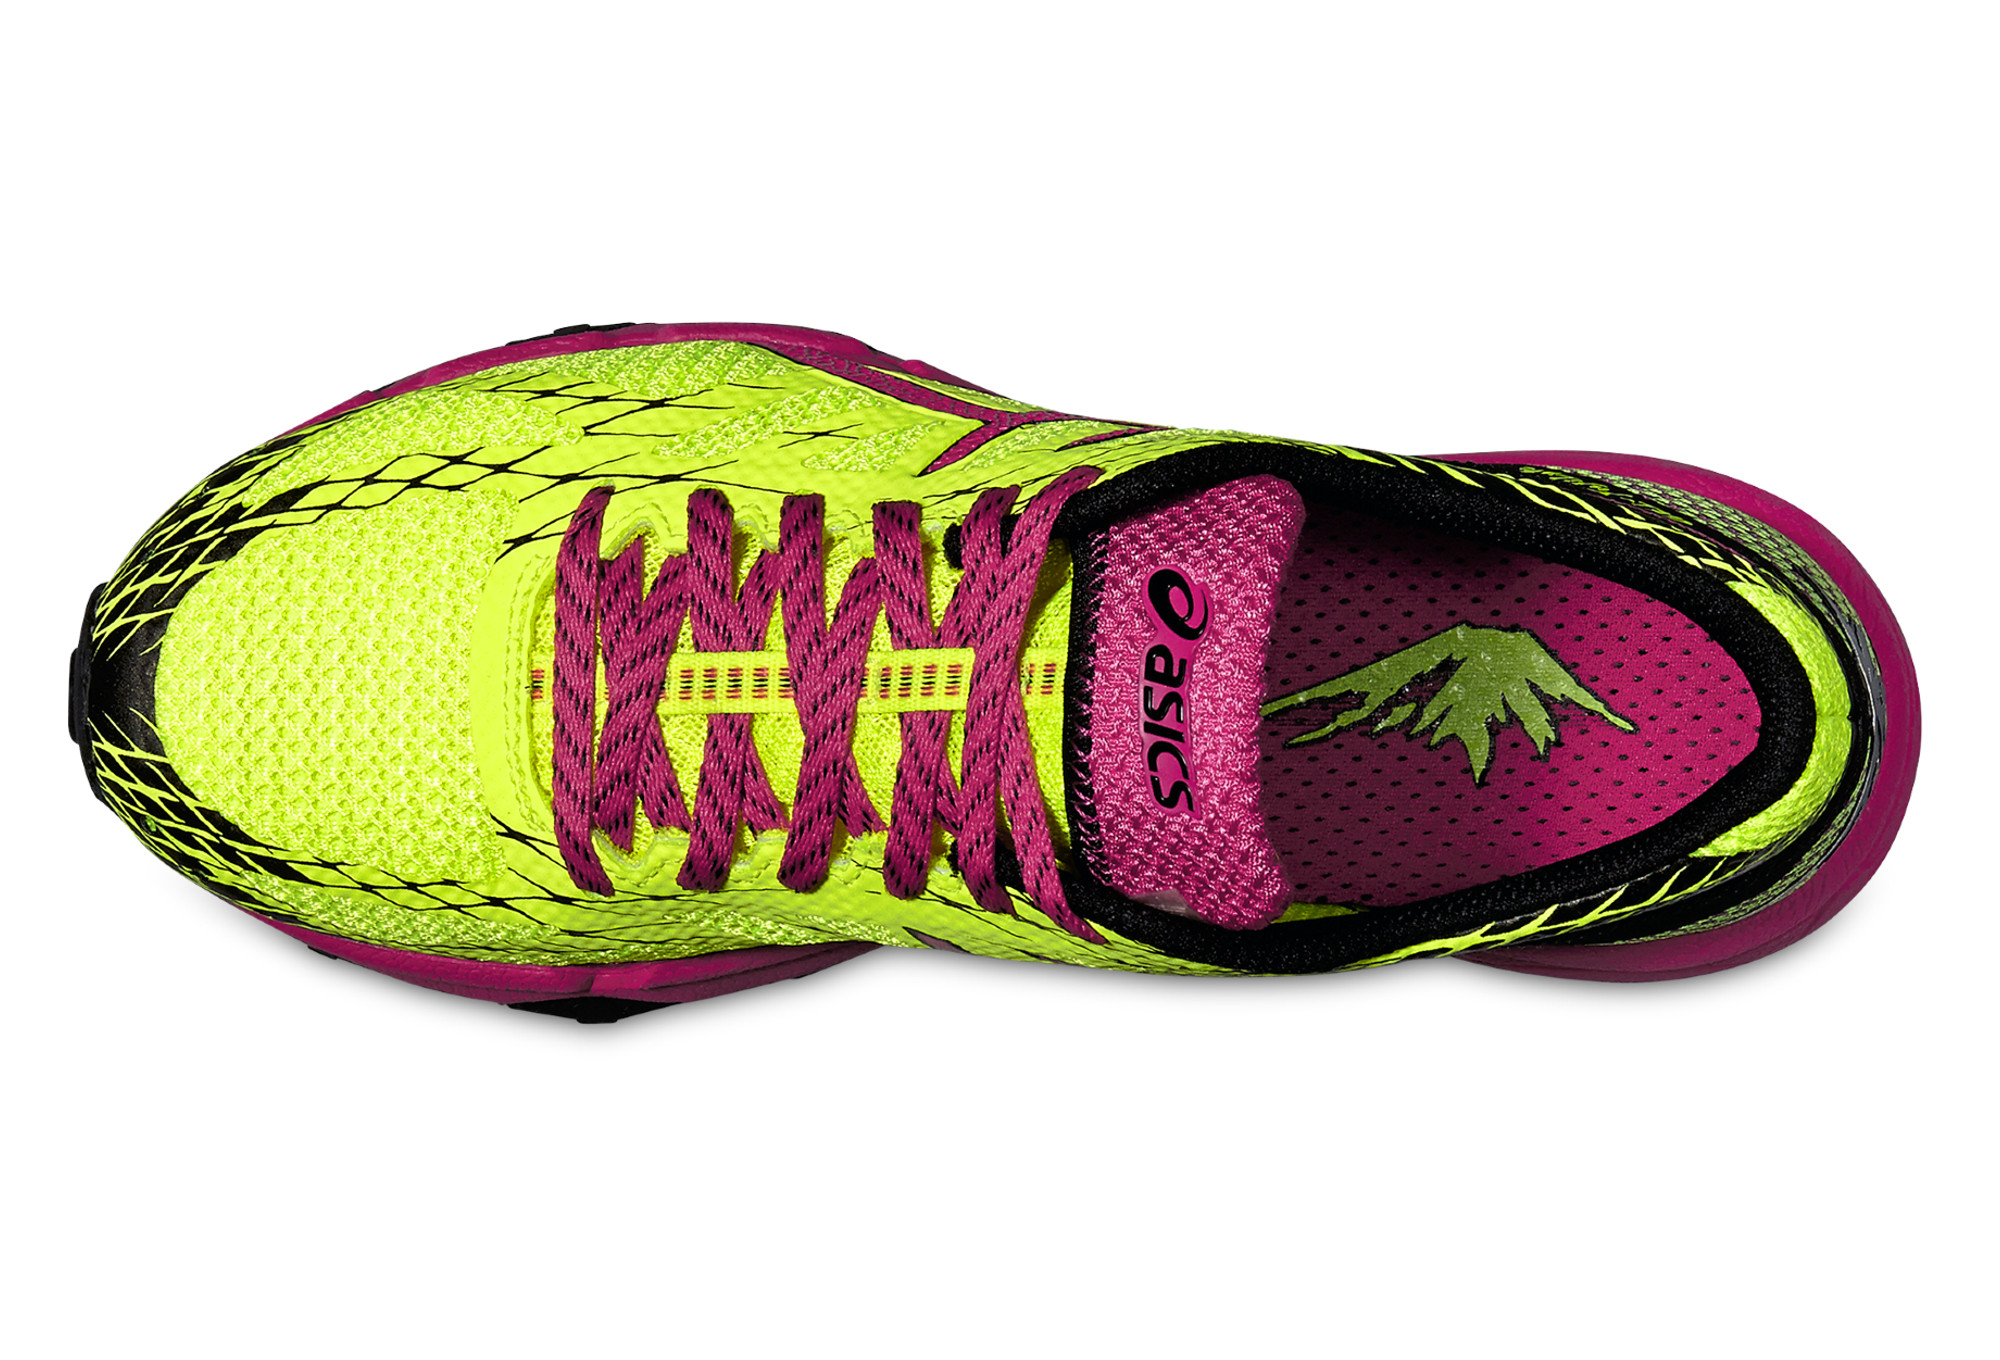 Trail Noir Fujilyte Chaussures Femme Gel De Asics Jaune Rose 5Aj43RLq